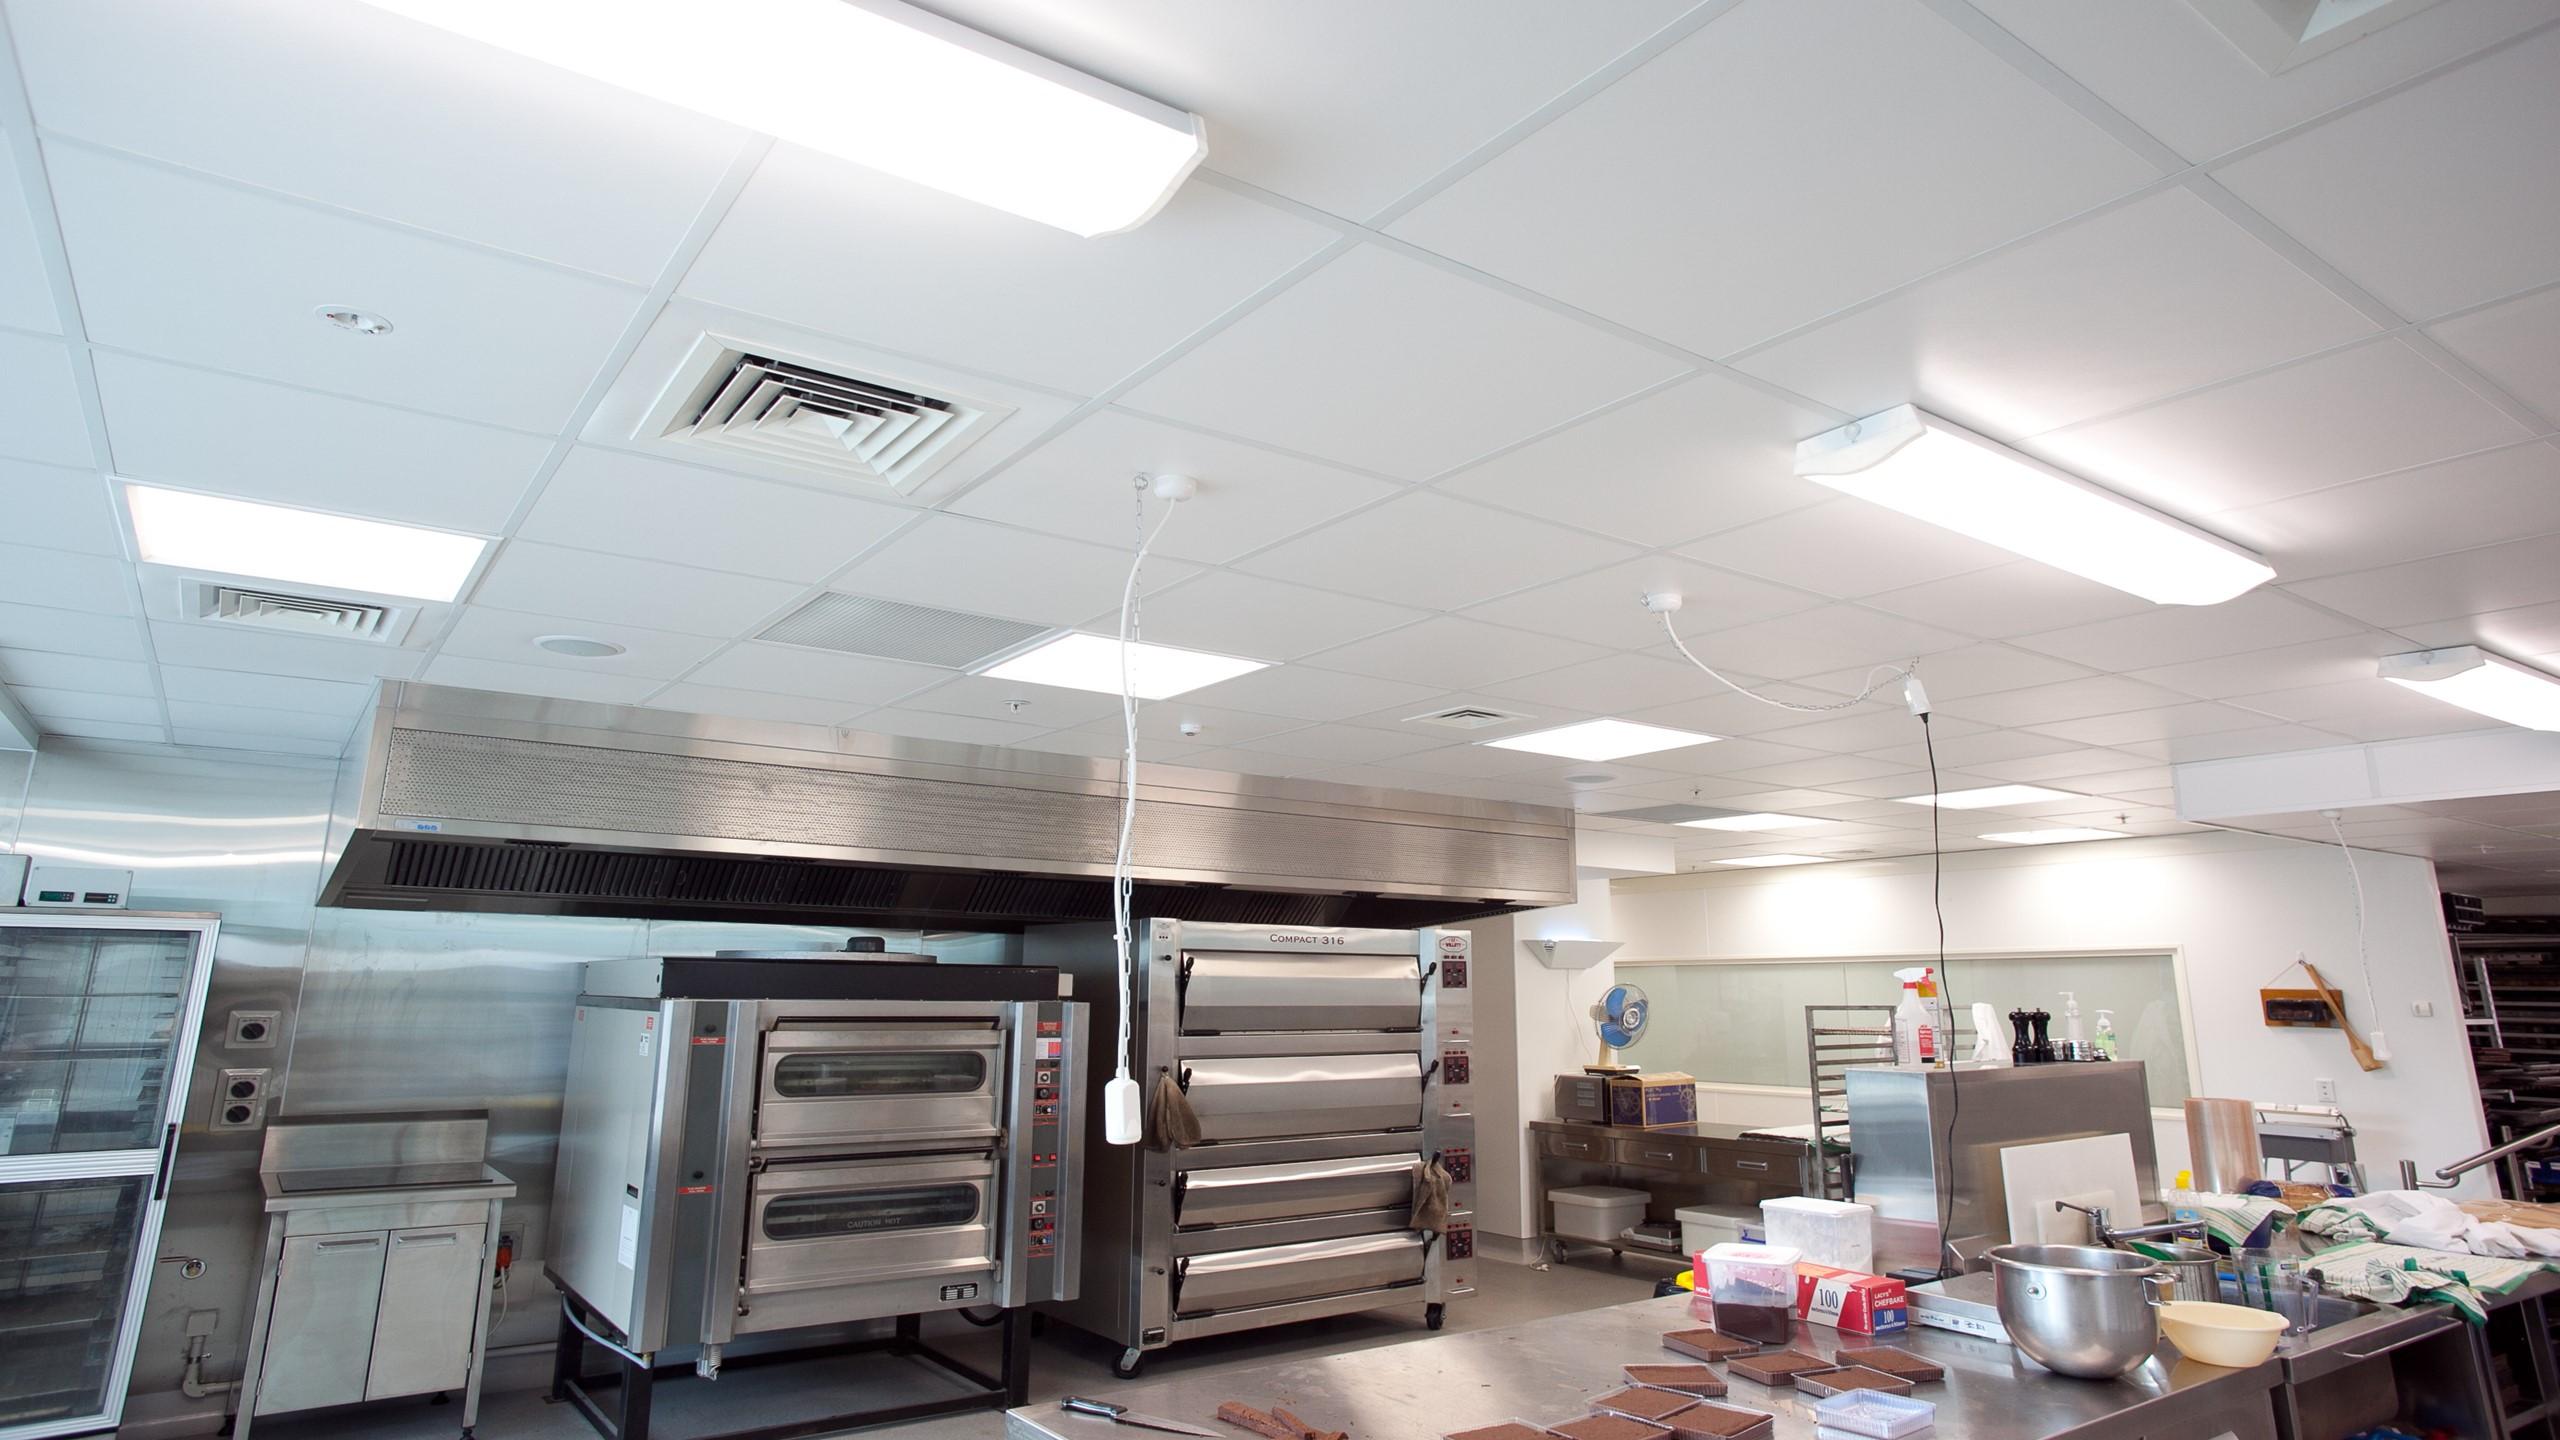 Goodman Feilding food tech training room showing Triton Hygiene installed into a grid & tile system.